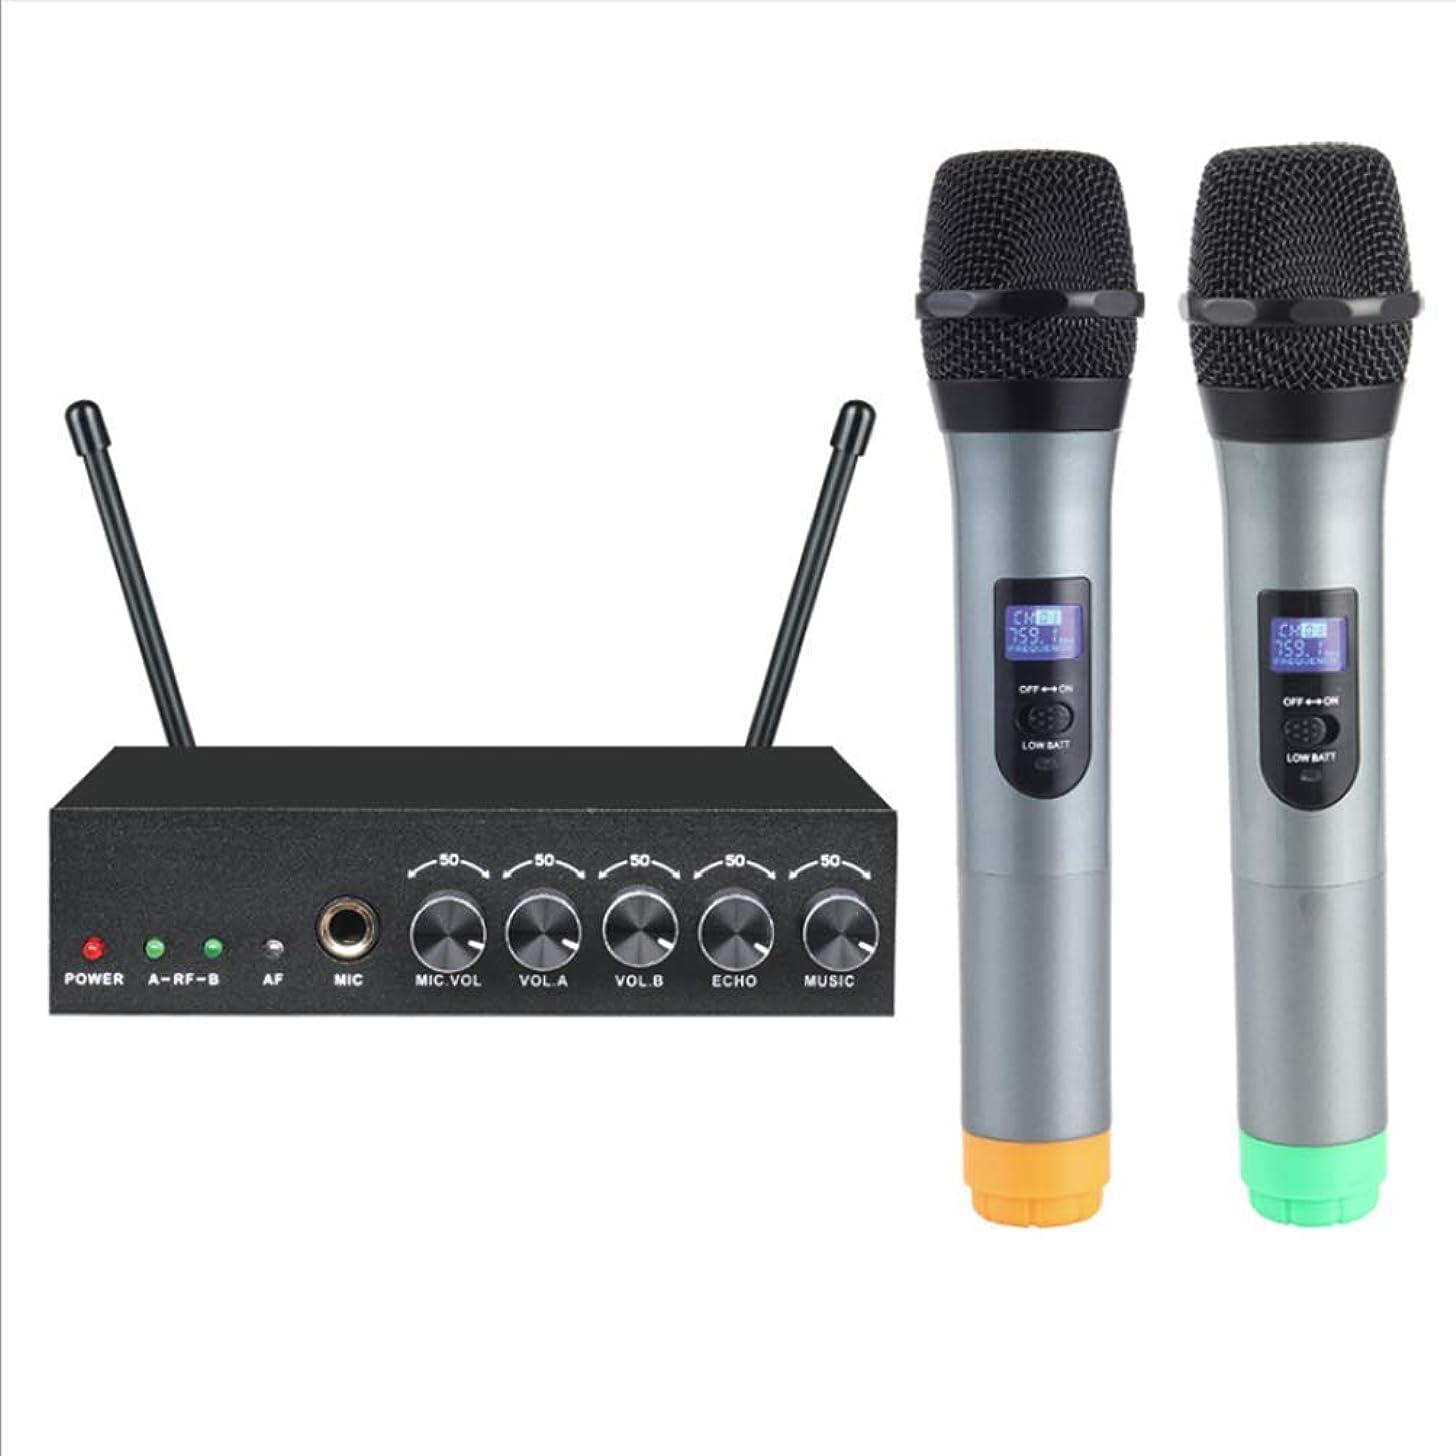 KOQIO Wireless Microphone Karaoke,2 Handheld Karaoke Player Speaker LCD Display Portable for TV, Computer, and Mobile Phone, Home KTV Outdoor Party Wedding